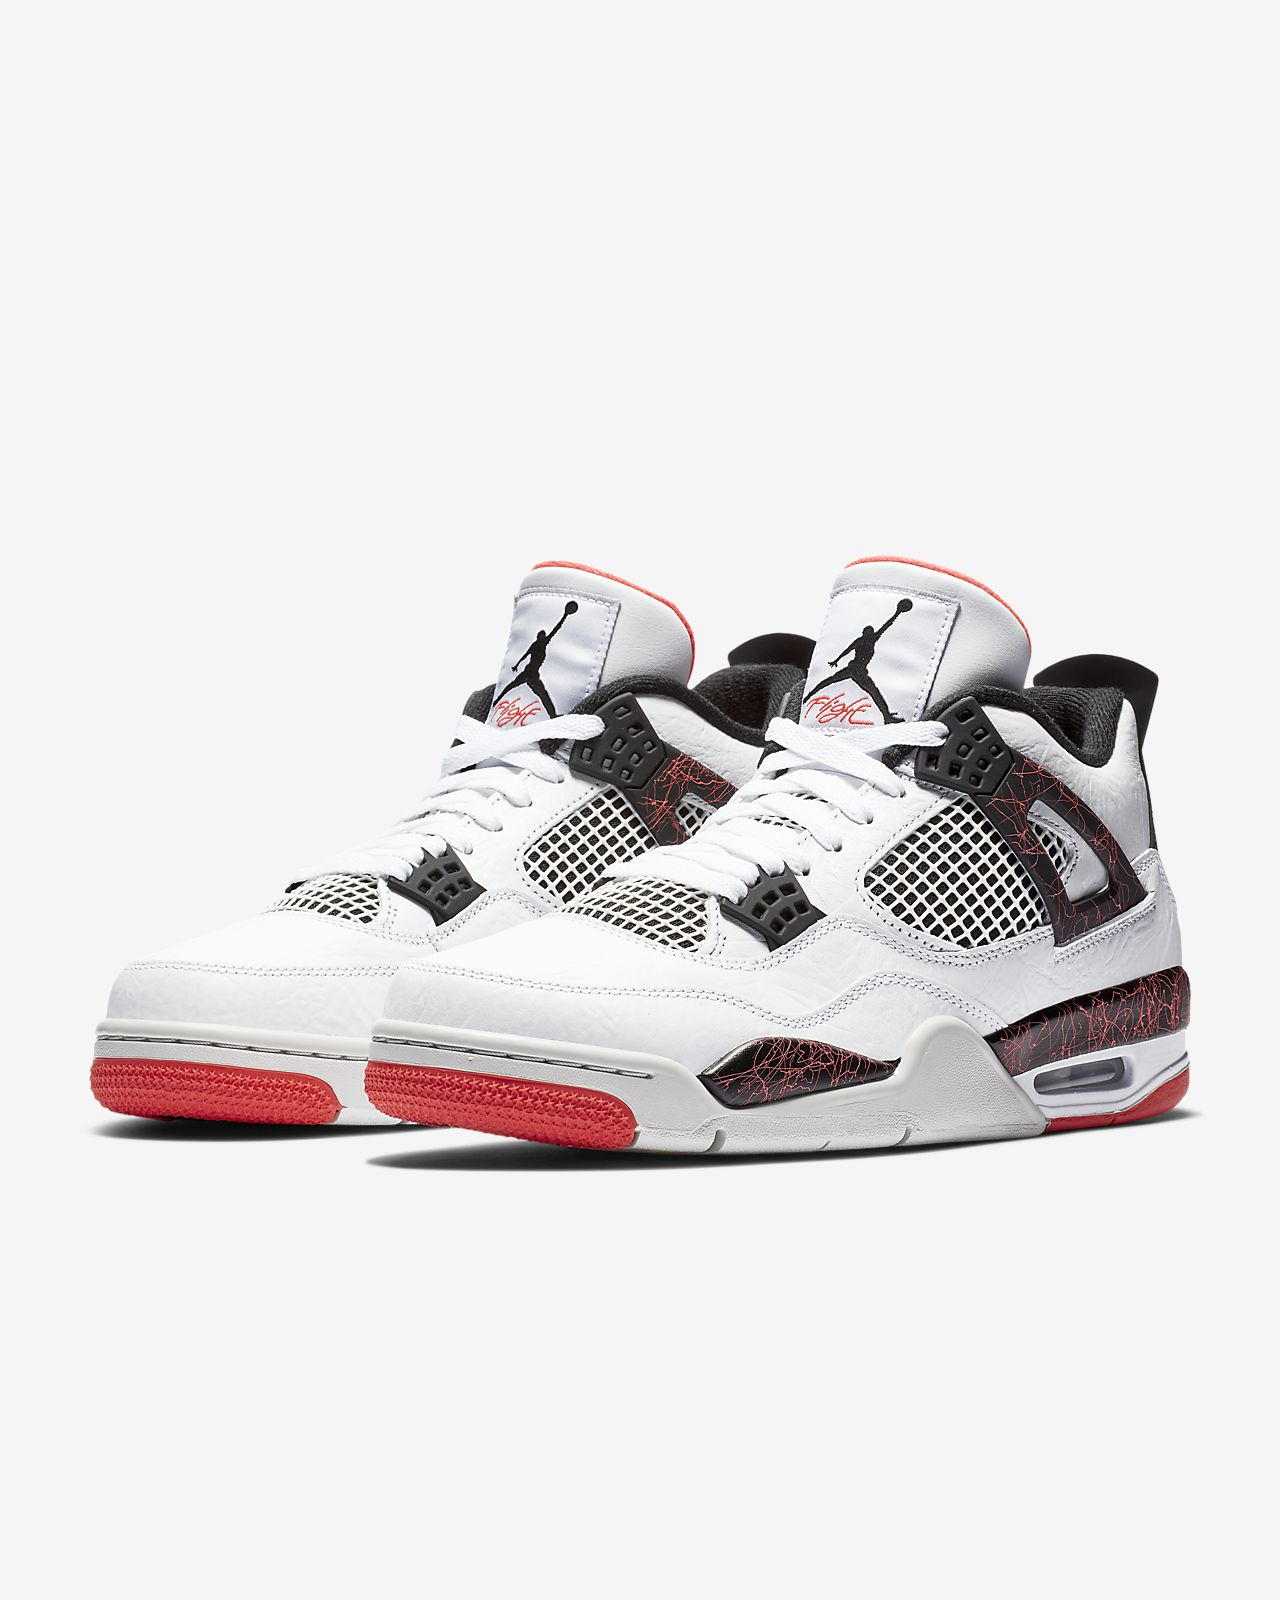 295c0b8ae12857 Air Jordan 4 Retro Men s Shoe. Nike.com GB